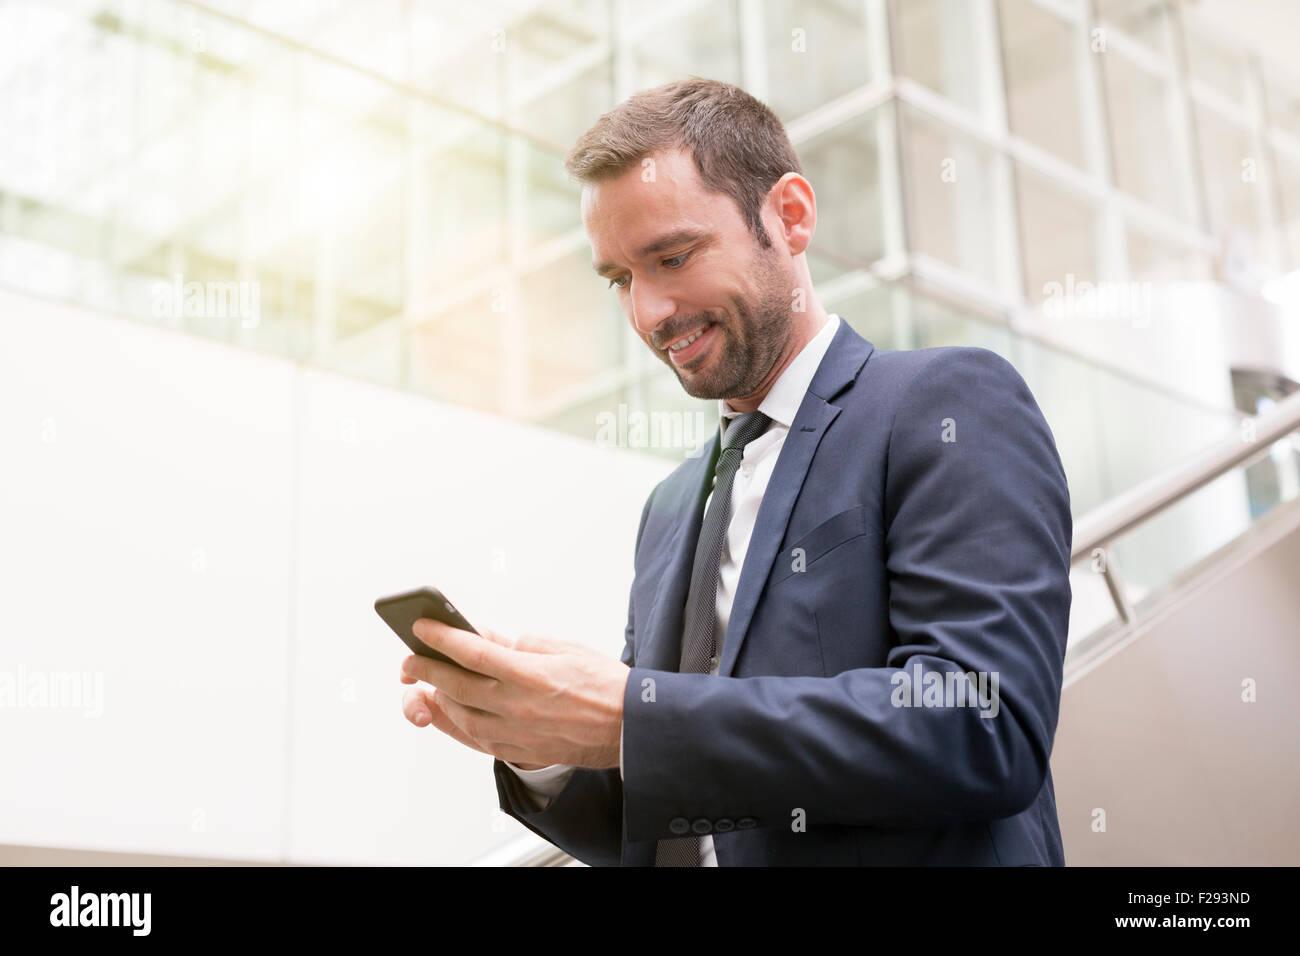 Businessman sending a SMS - Stock Image